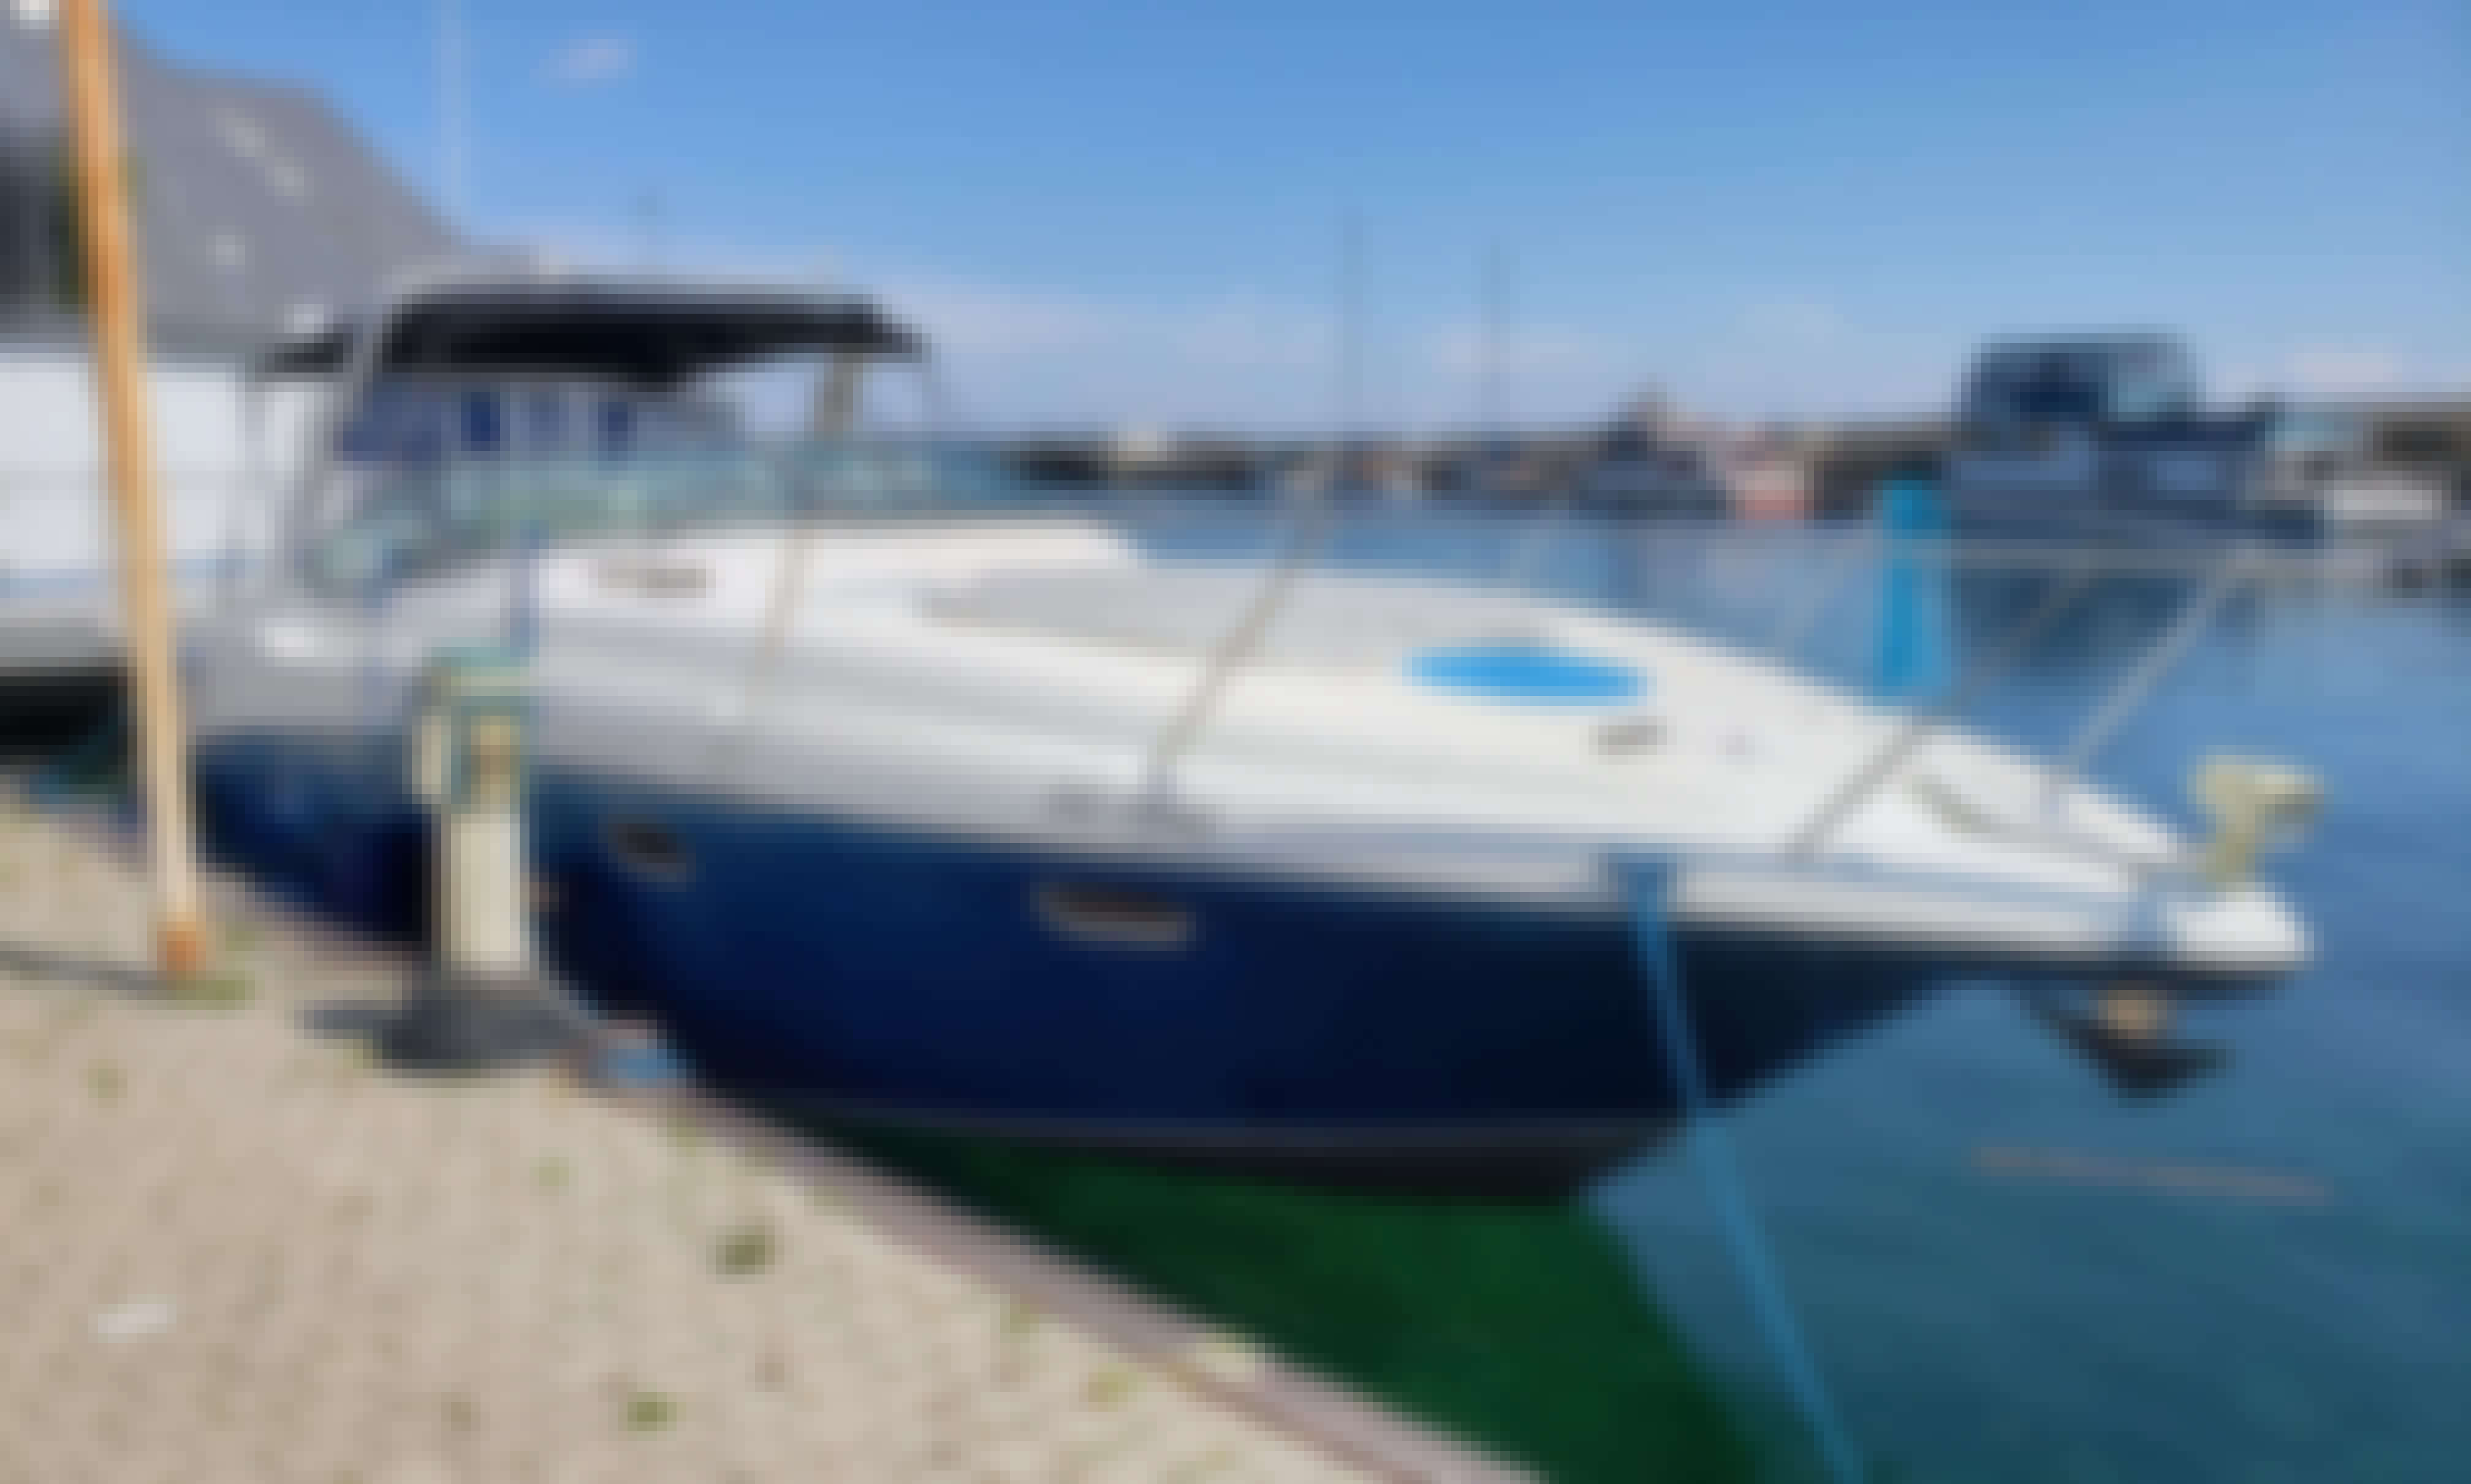 Four Winns Motor Yacht Rental in Toronto, Ontario